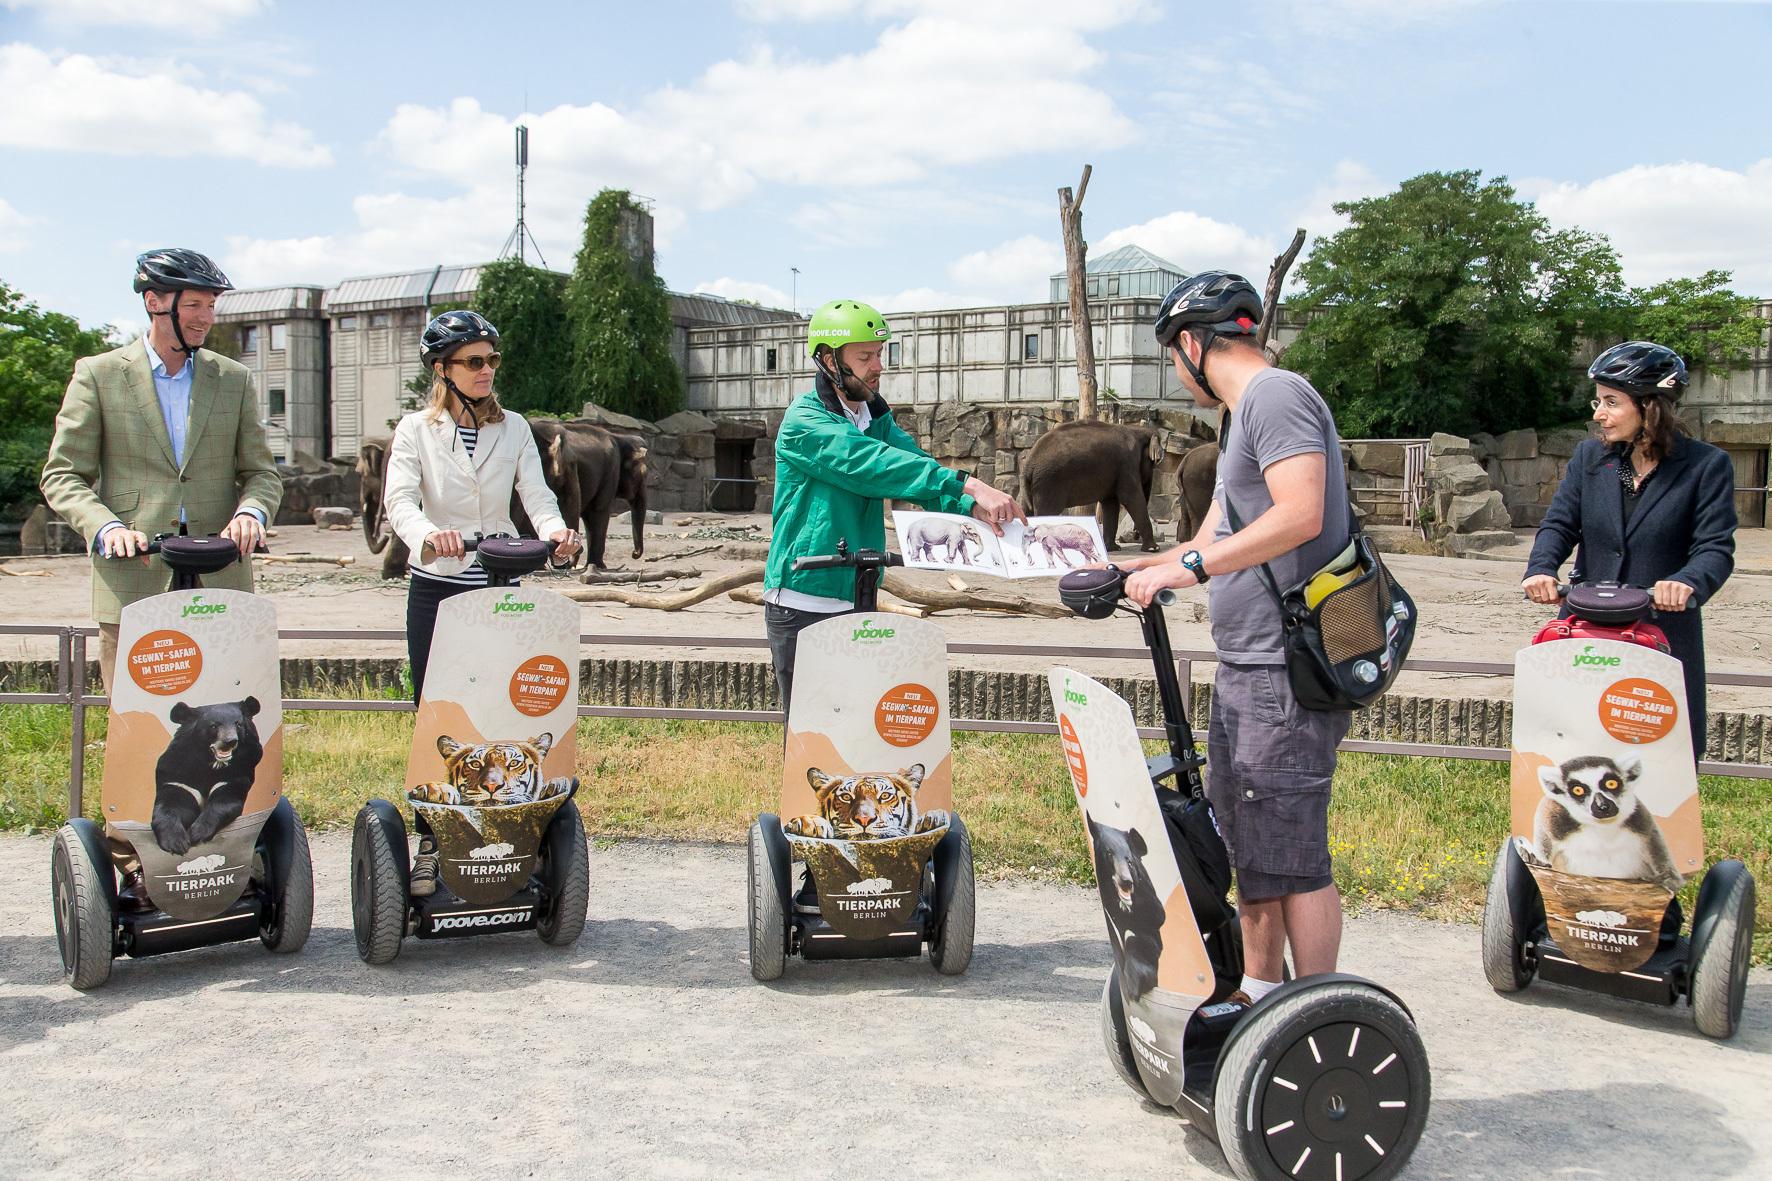 tierpark bietet gef hrte segway touren an friedrichsfelde. Black Bedroom Furniture Sets. Home Design Ideas